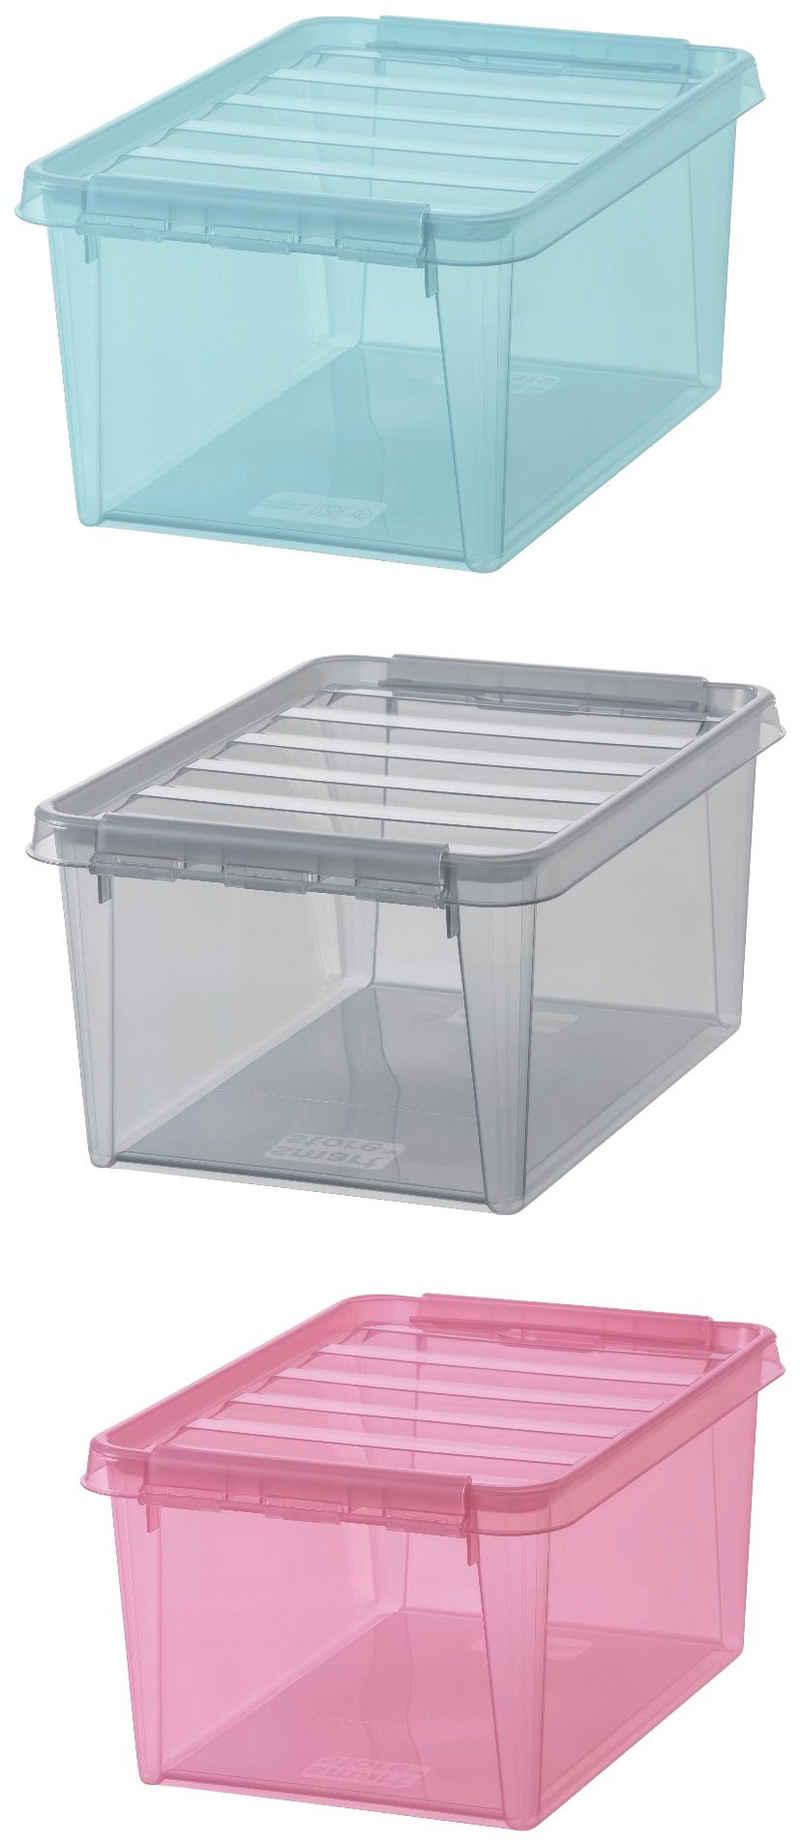 Orthex Aufbewahrungsbox »Smart Store Colour 15« (Set, 3 Stück), je 14 Liter